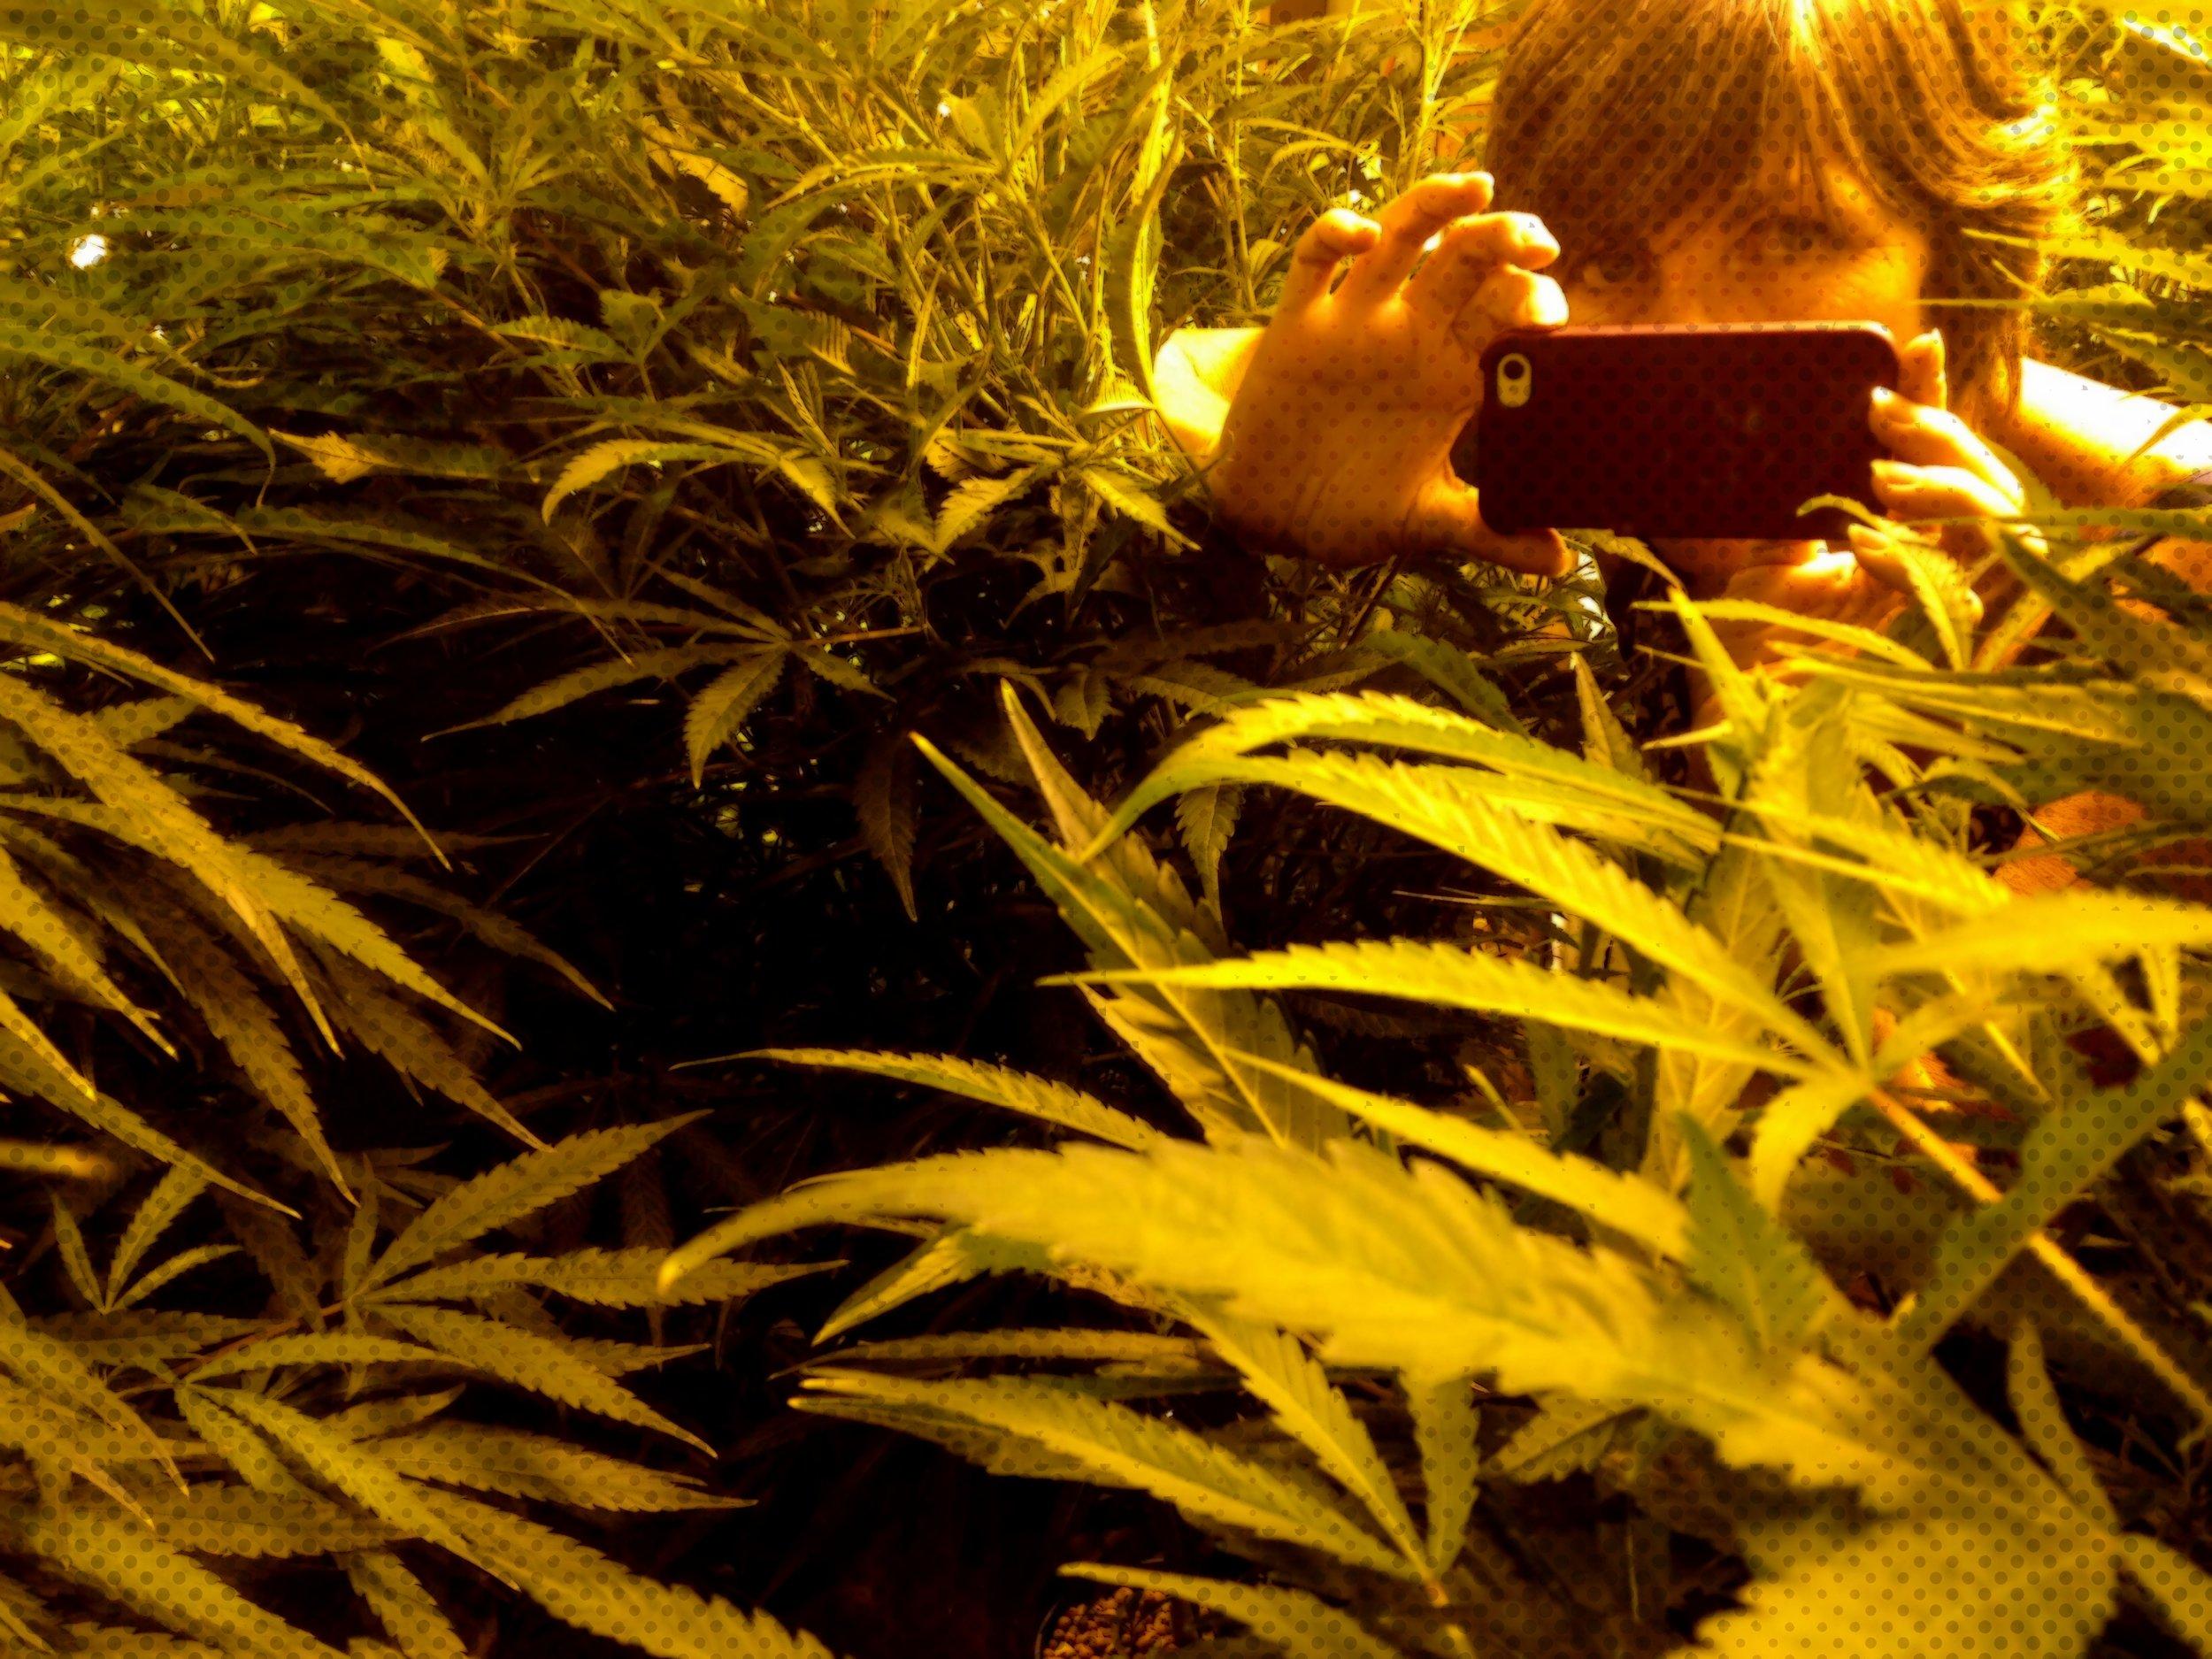 self-portrait, grow room, humboldt county, california photo: sharon letts